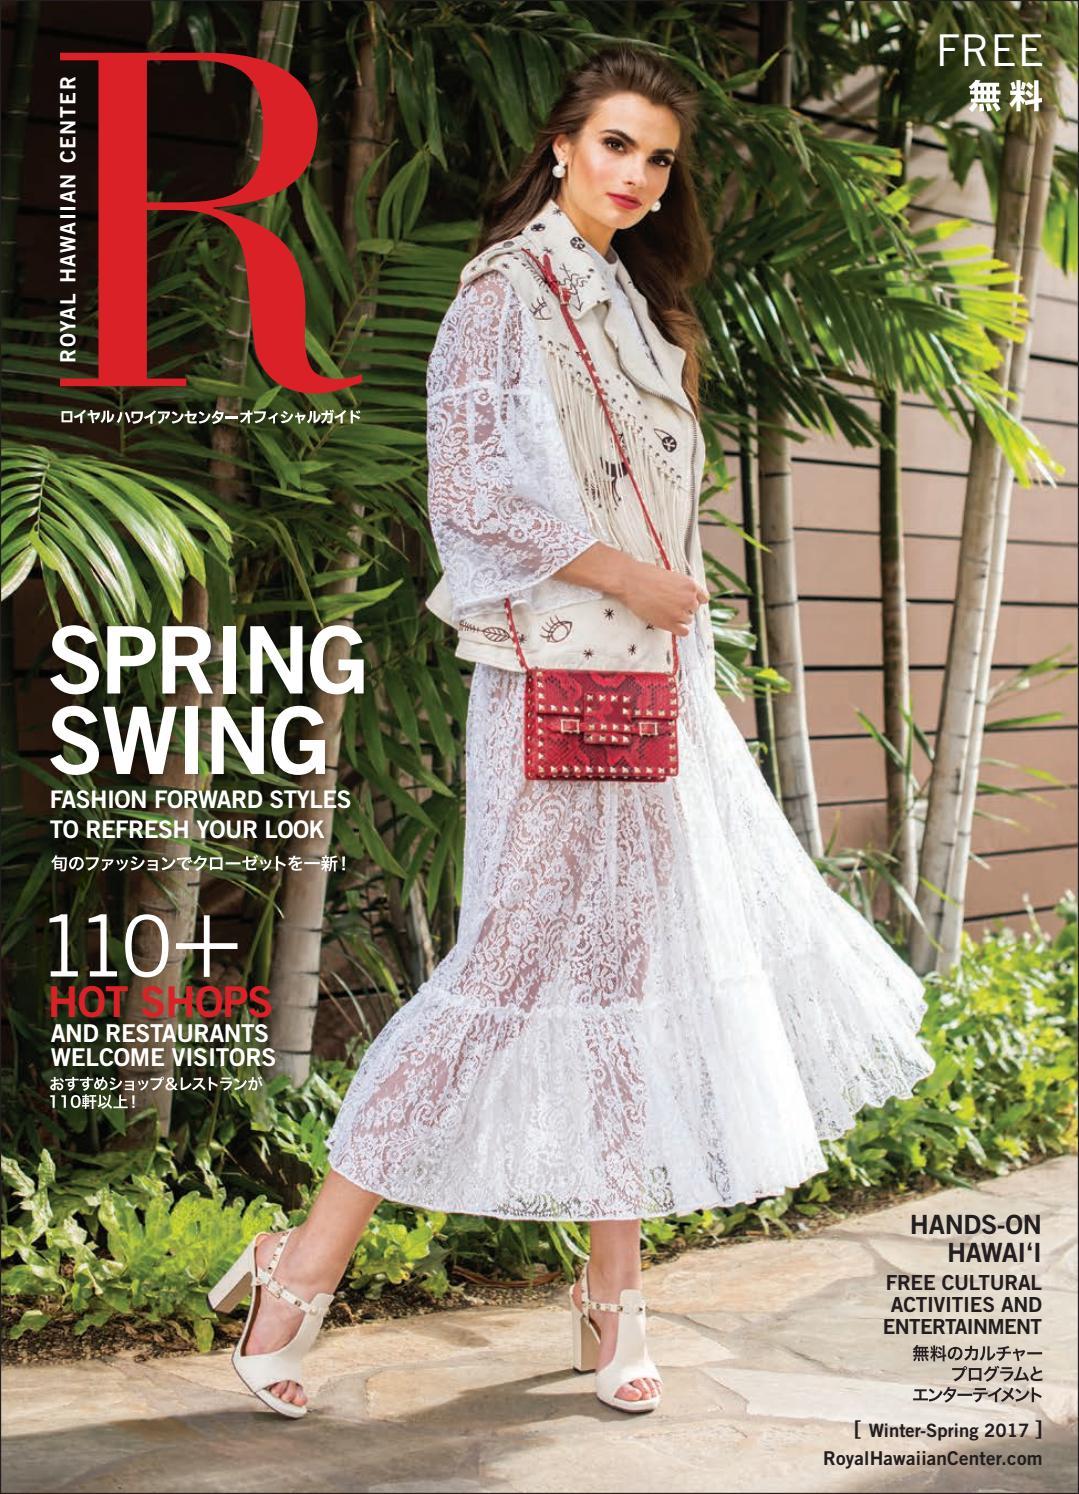 Royal Hawaiian Shopping Center Winter Spring 2017 by